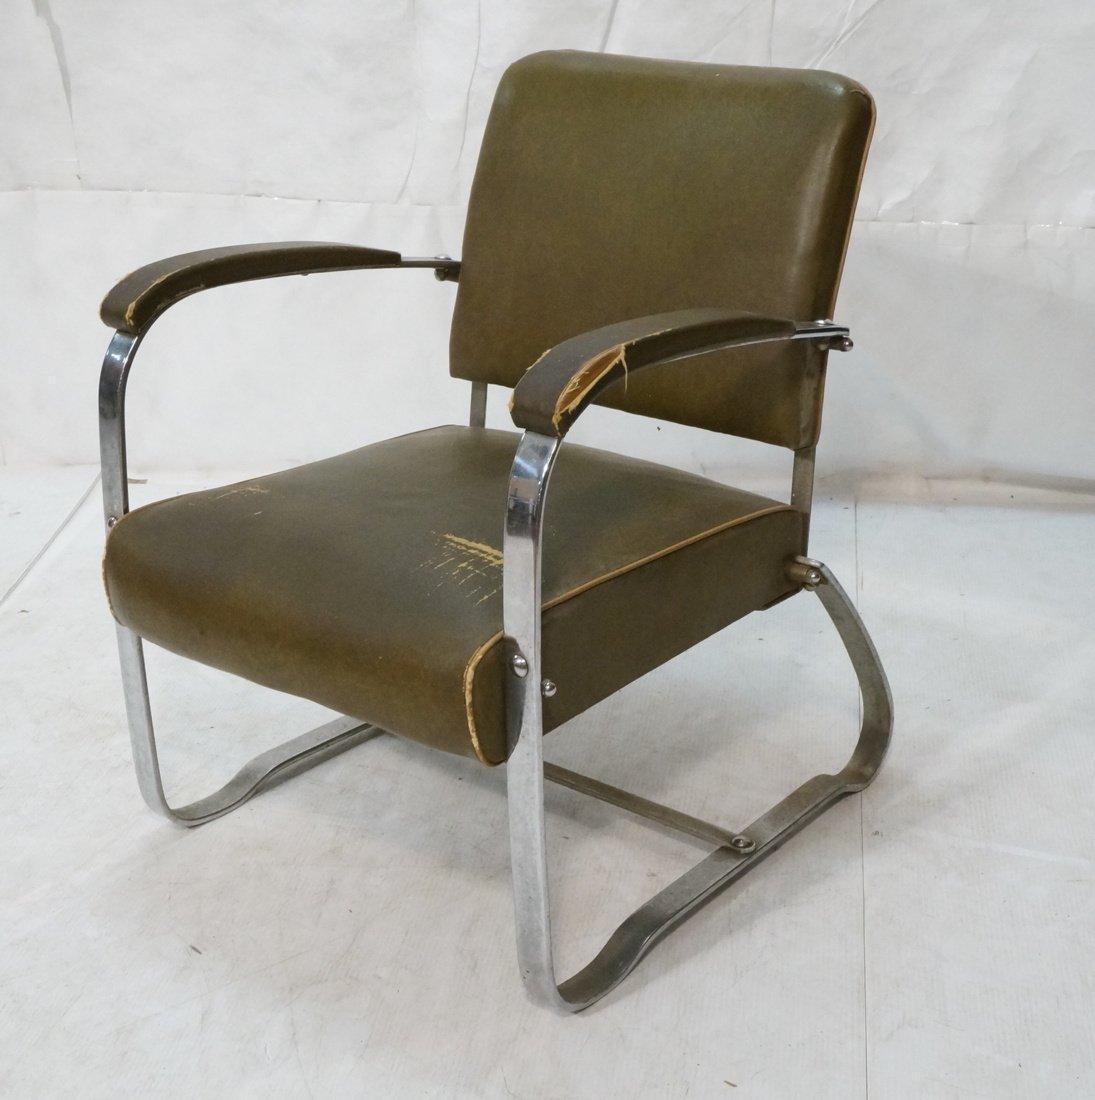 Green Vinyl Modernist Lounge Chair. Thin metal tu